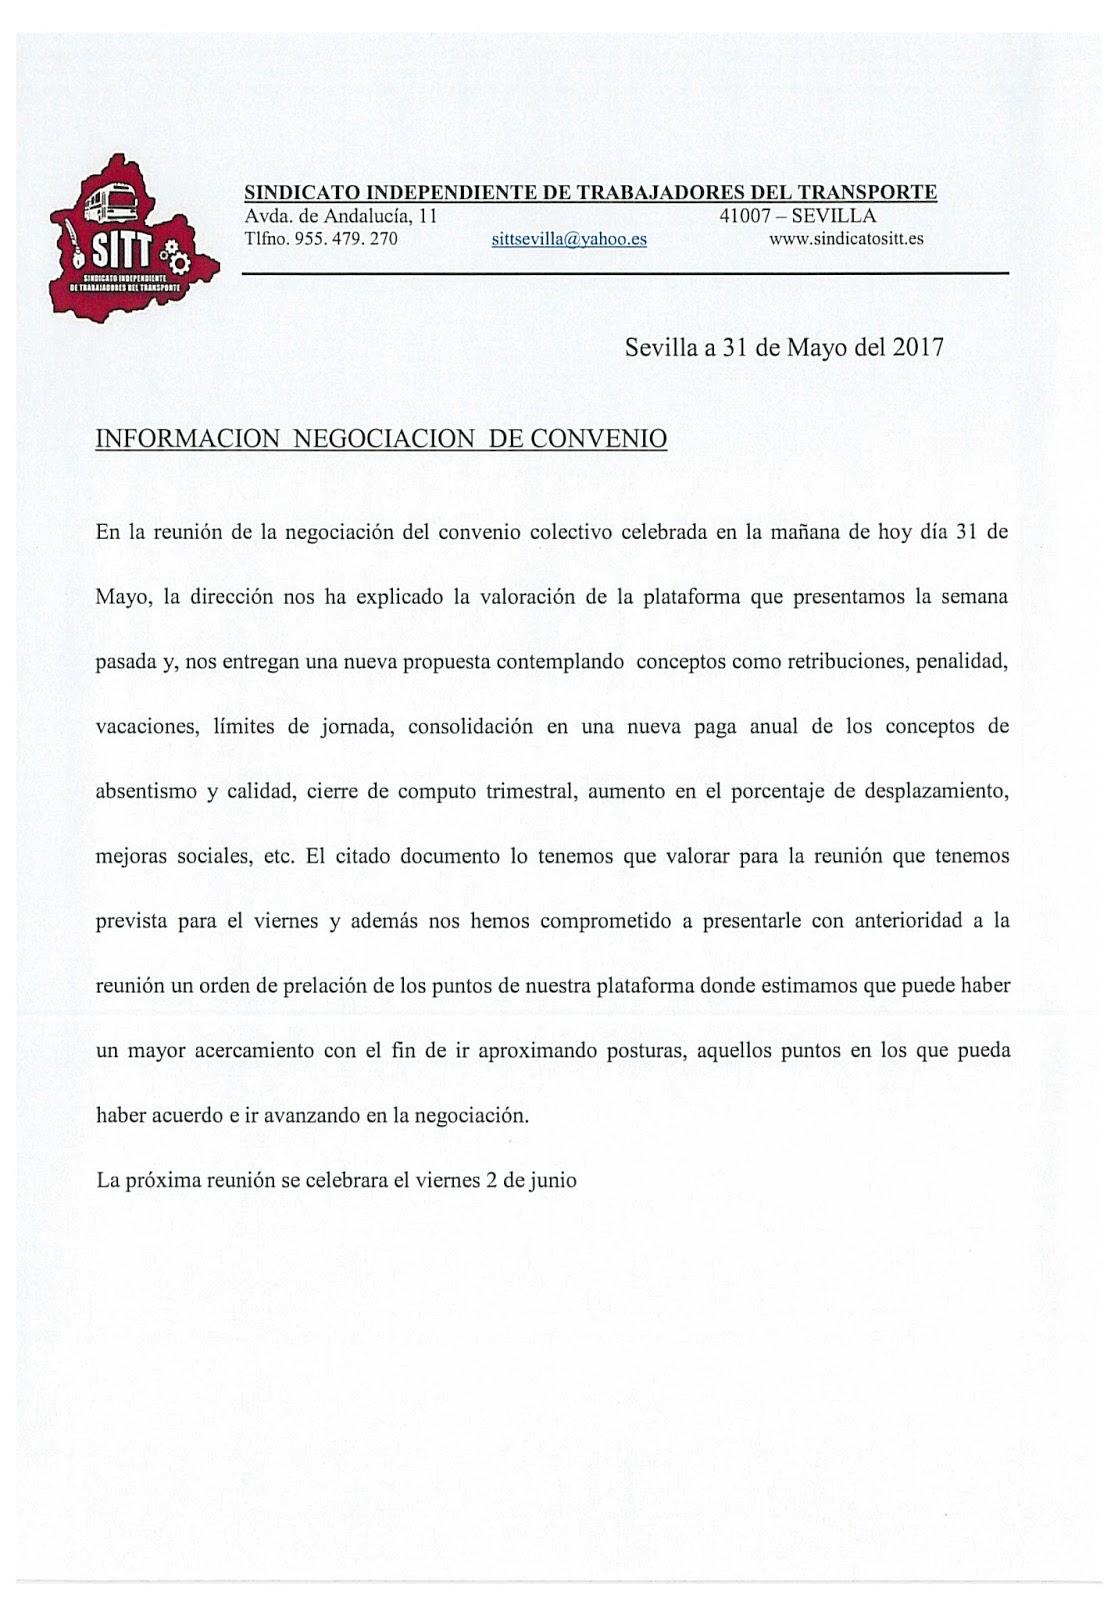 Sitt 7 reuni n de negociaci n convenio for Fuera de convenio 2017